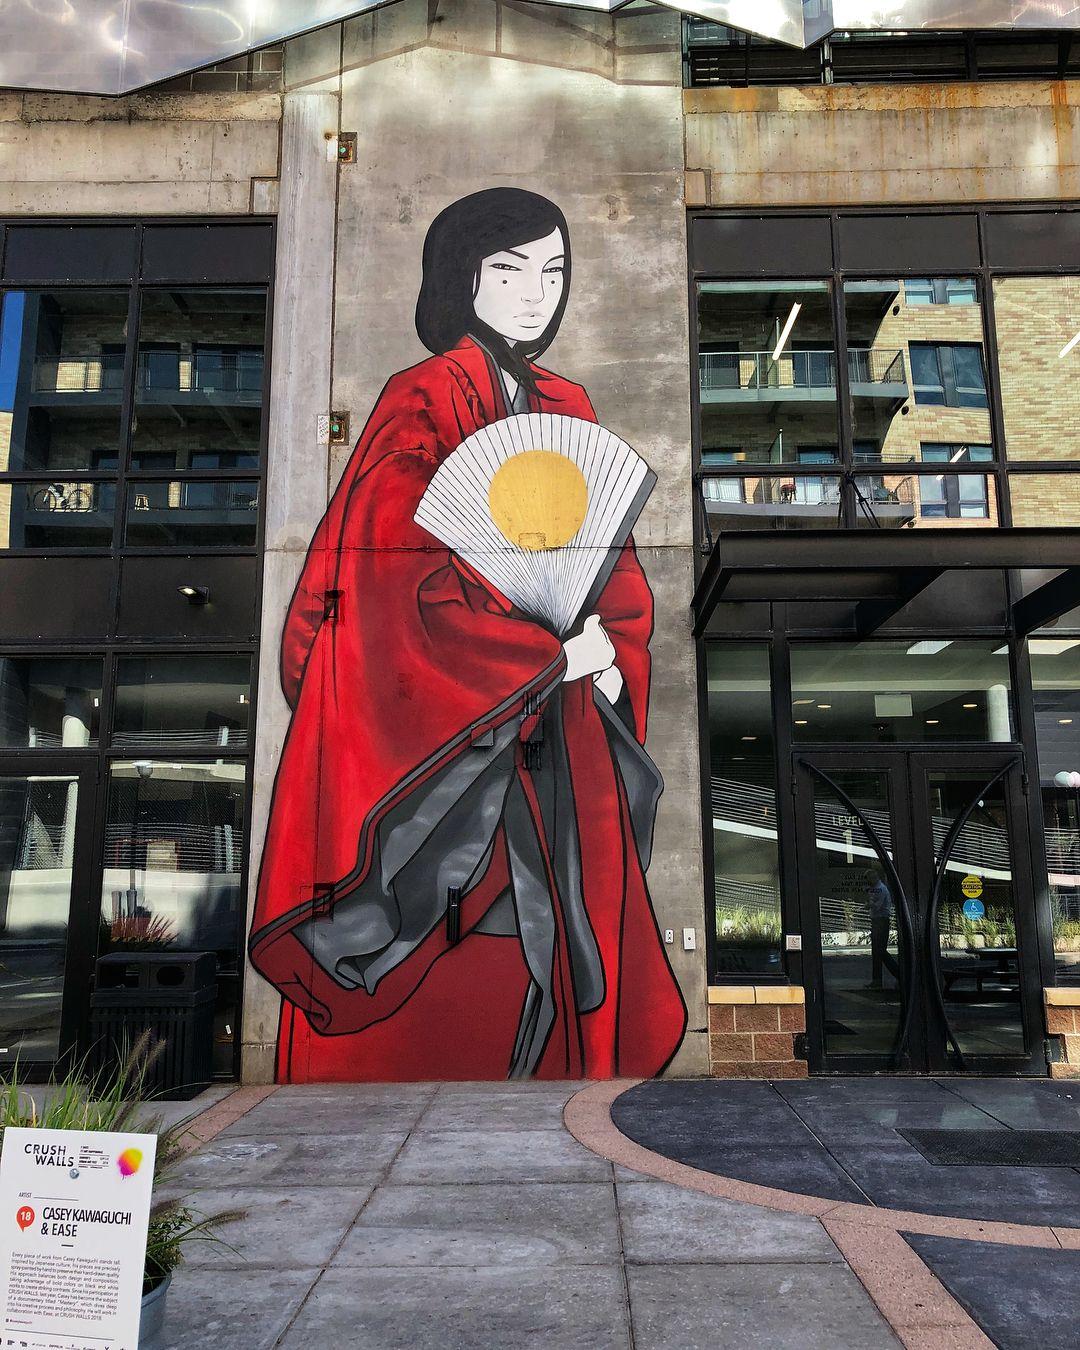 Mural Piece Kyojin By Japanese Artist Casey Kawaguchi In Denver